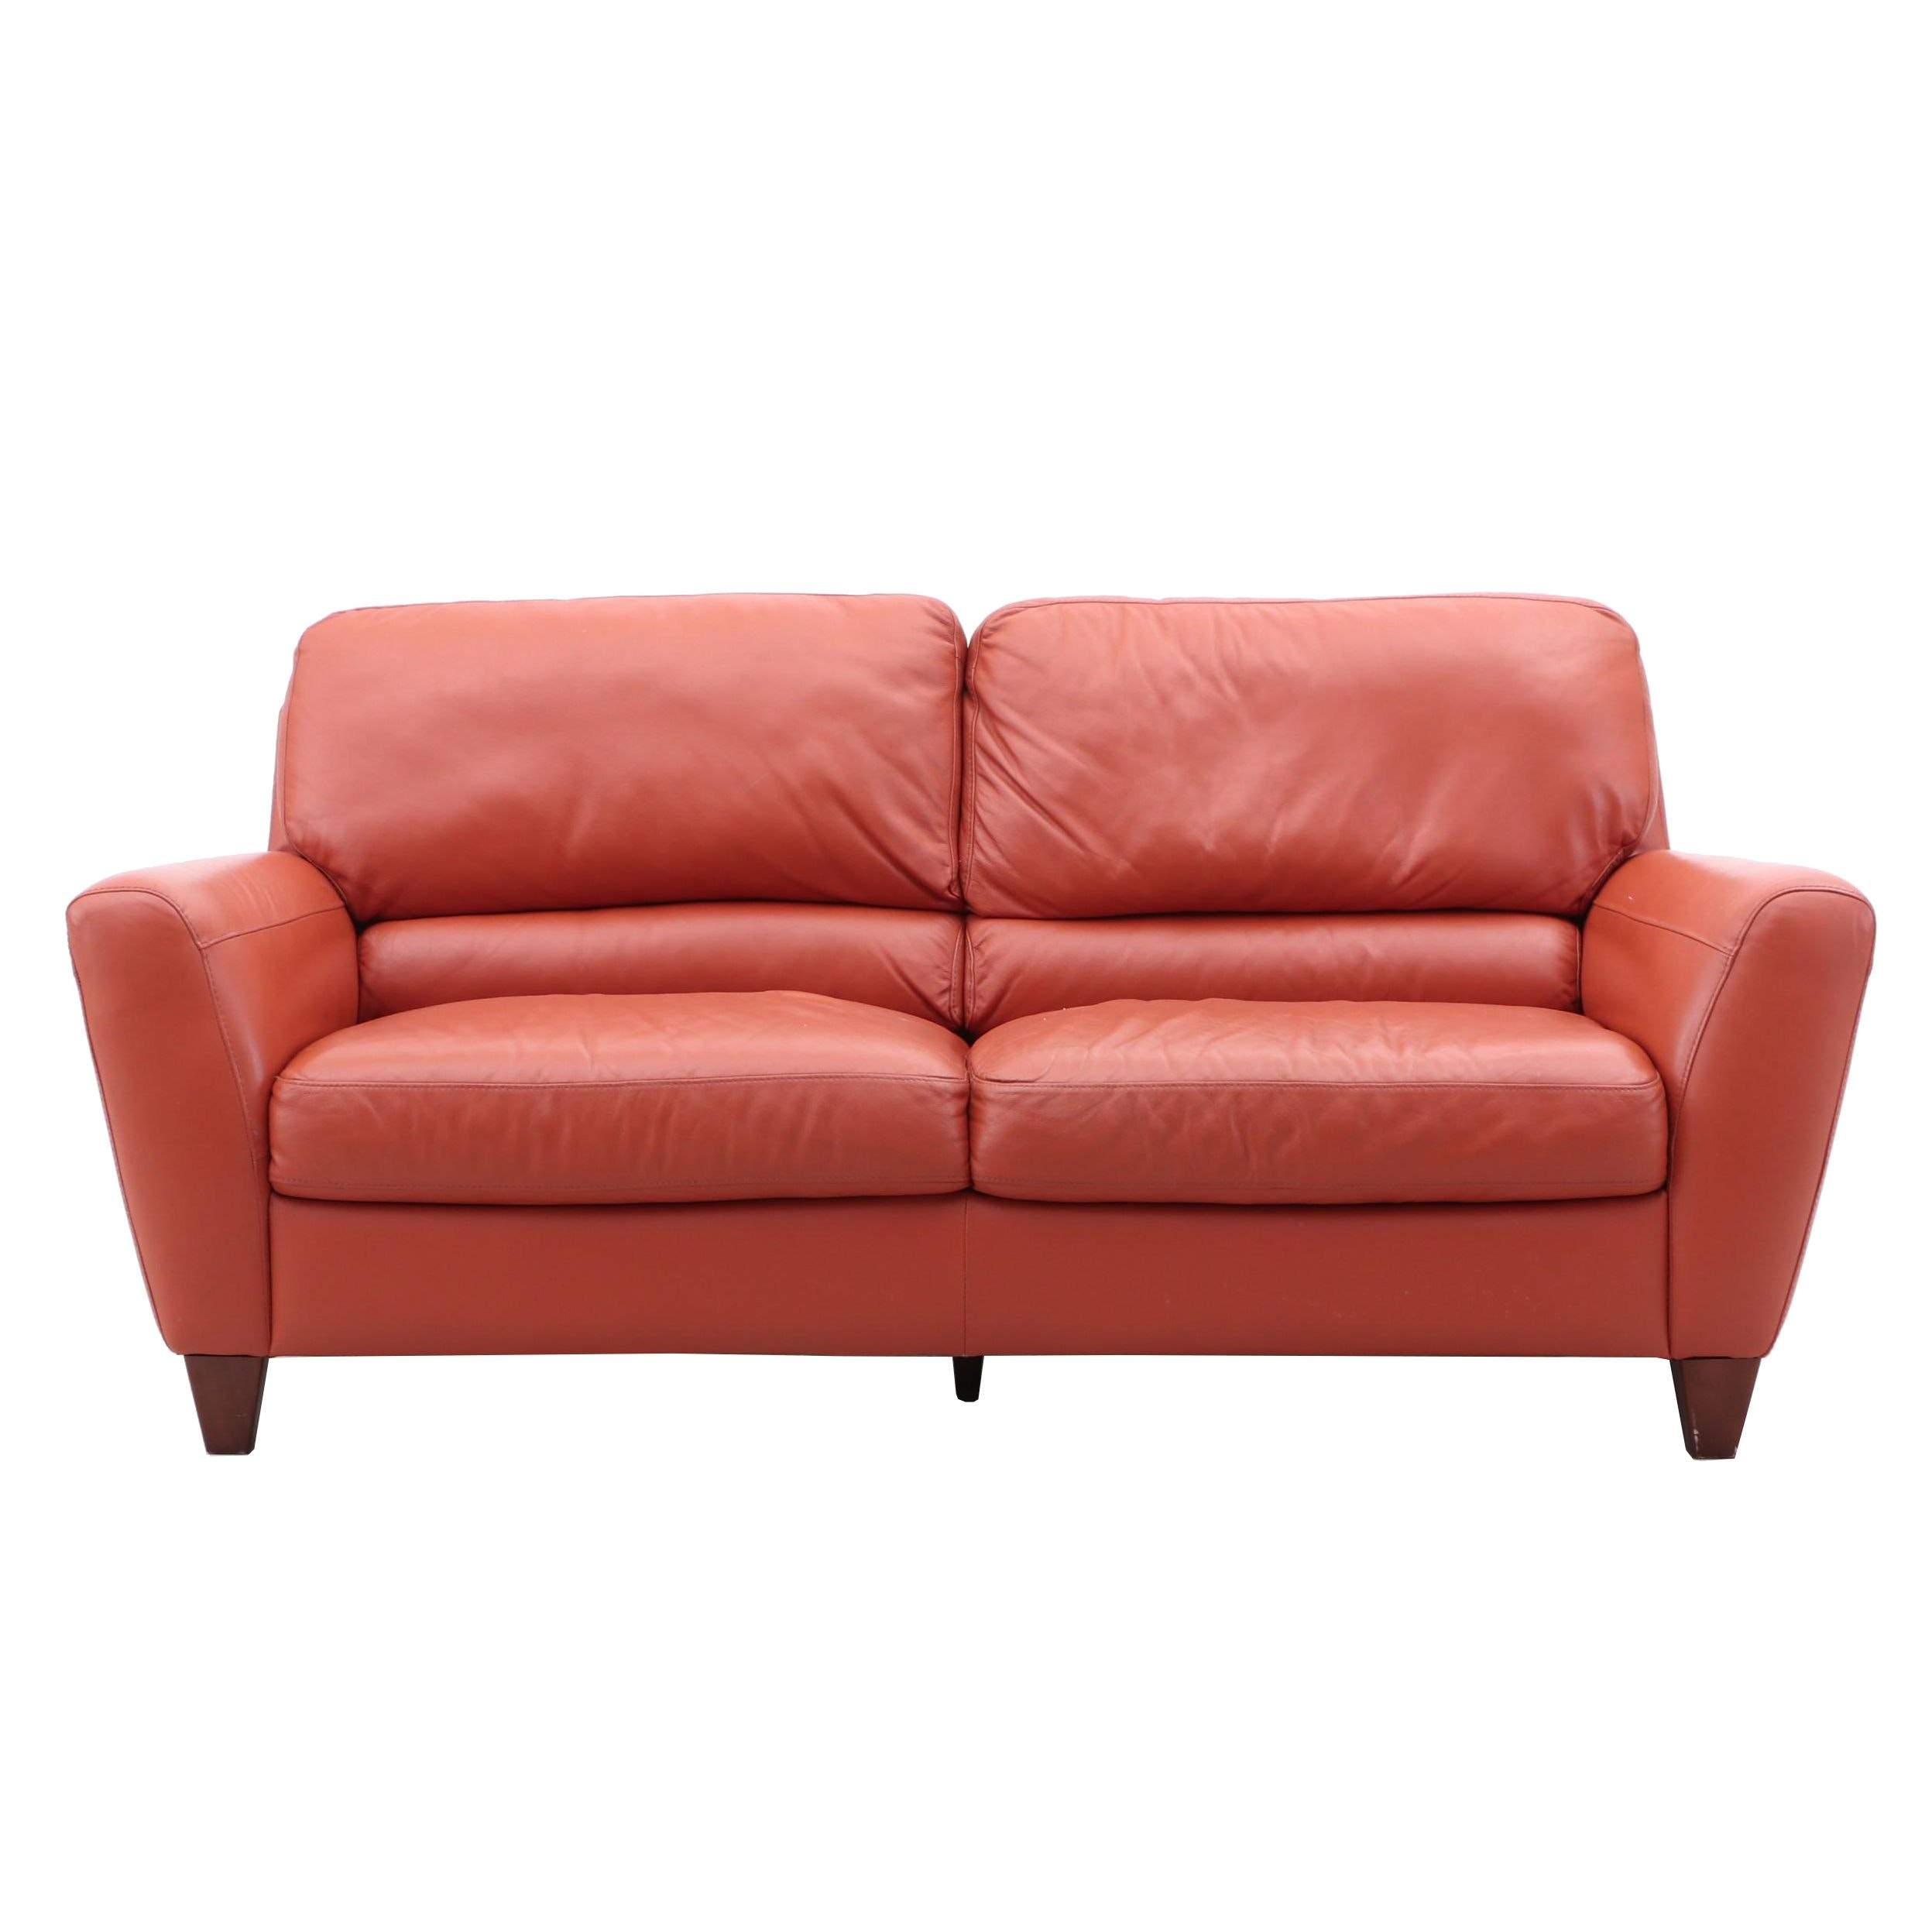 Modernist Leather Sofa by Italsofa Bahia